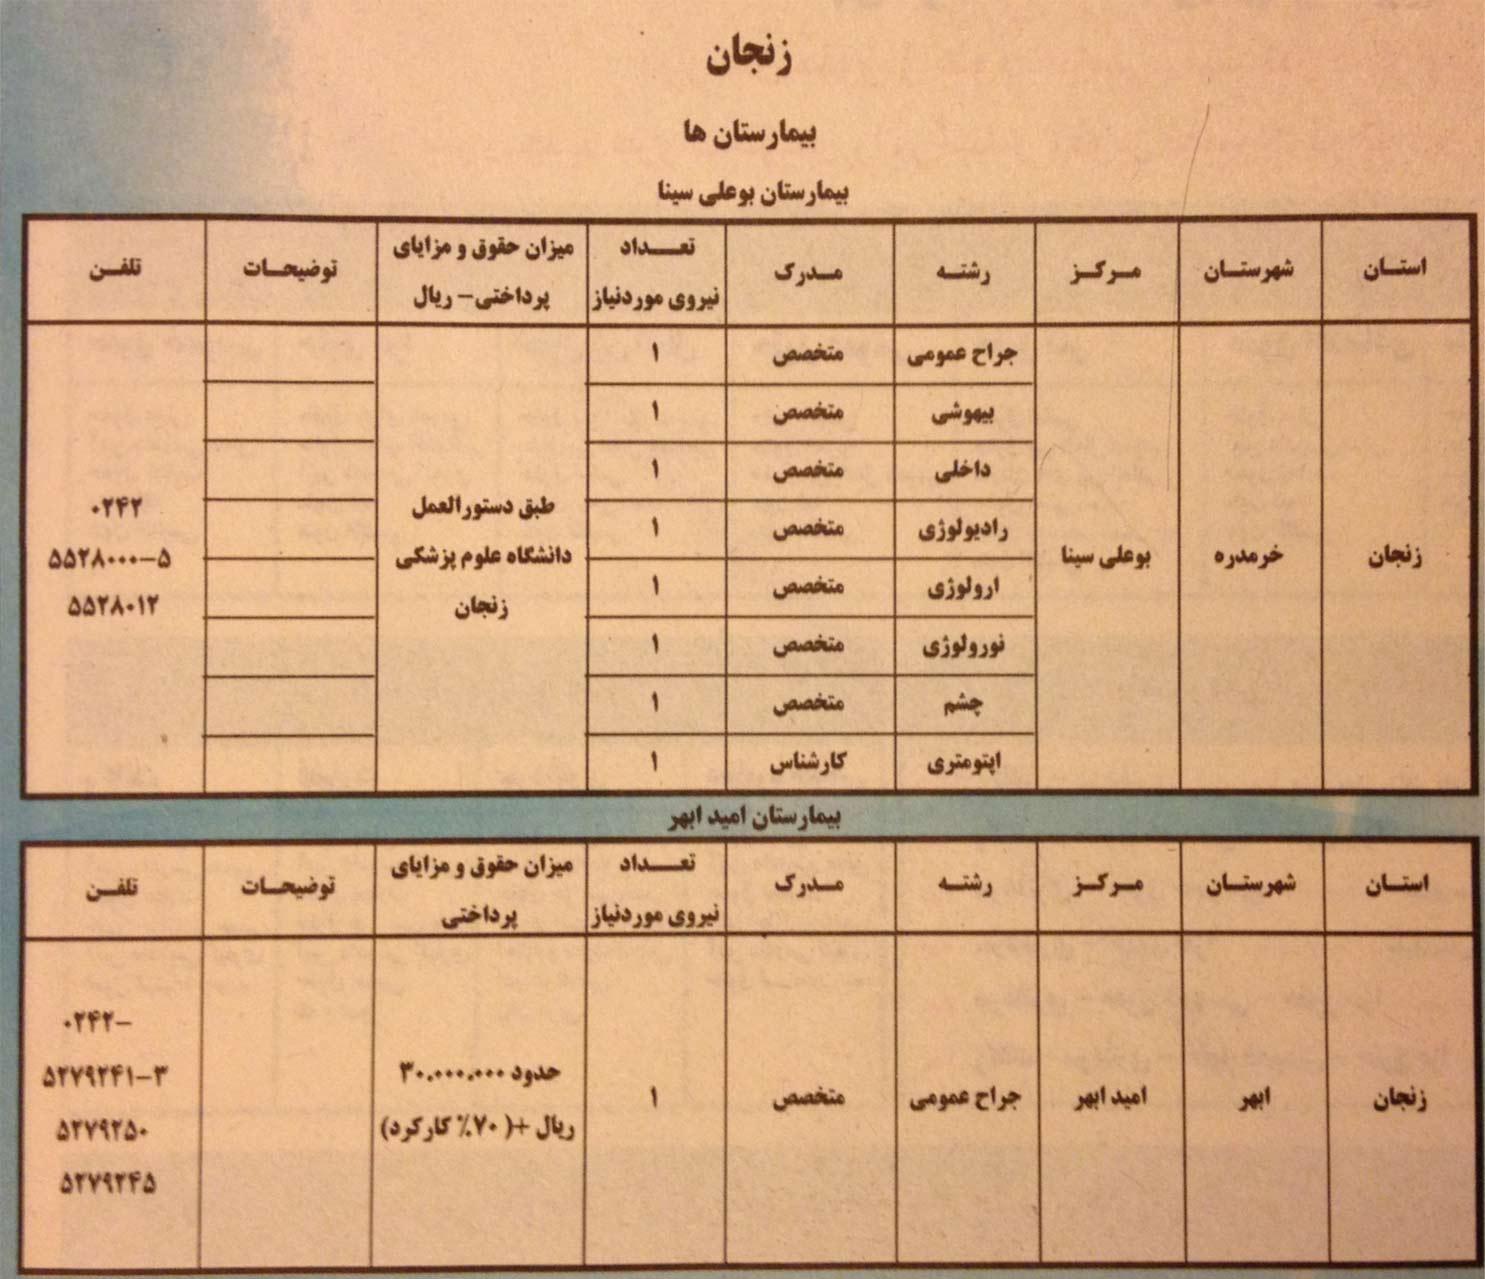 کانال تلگرام استخدام زنجان